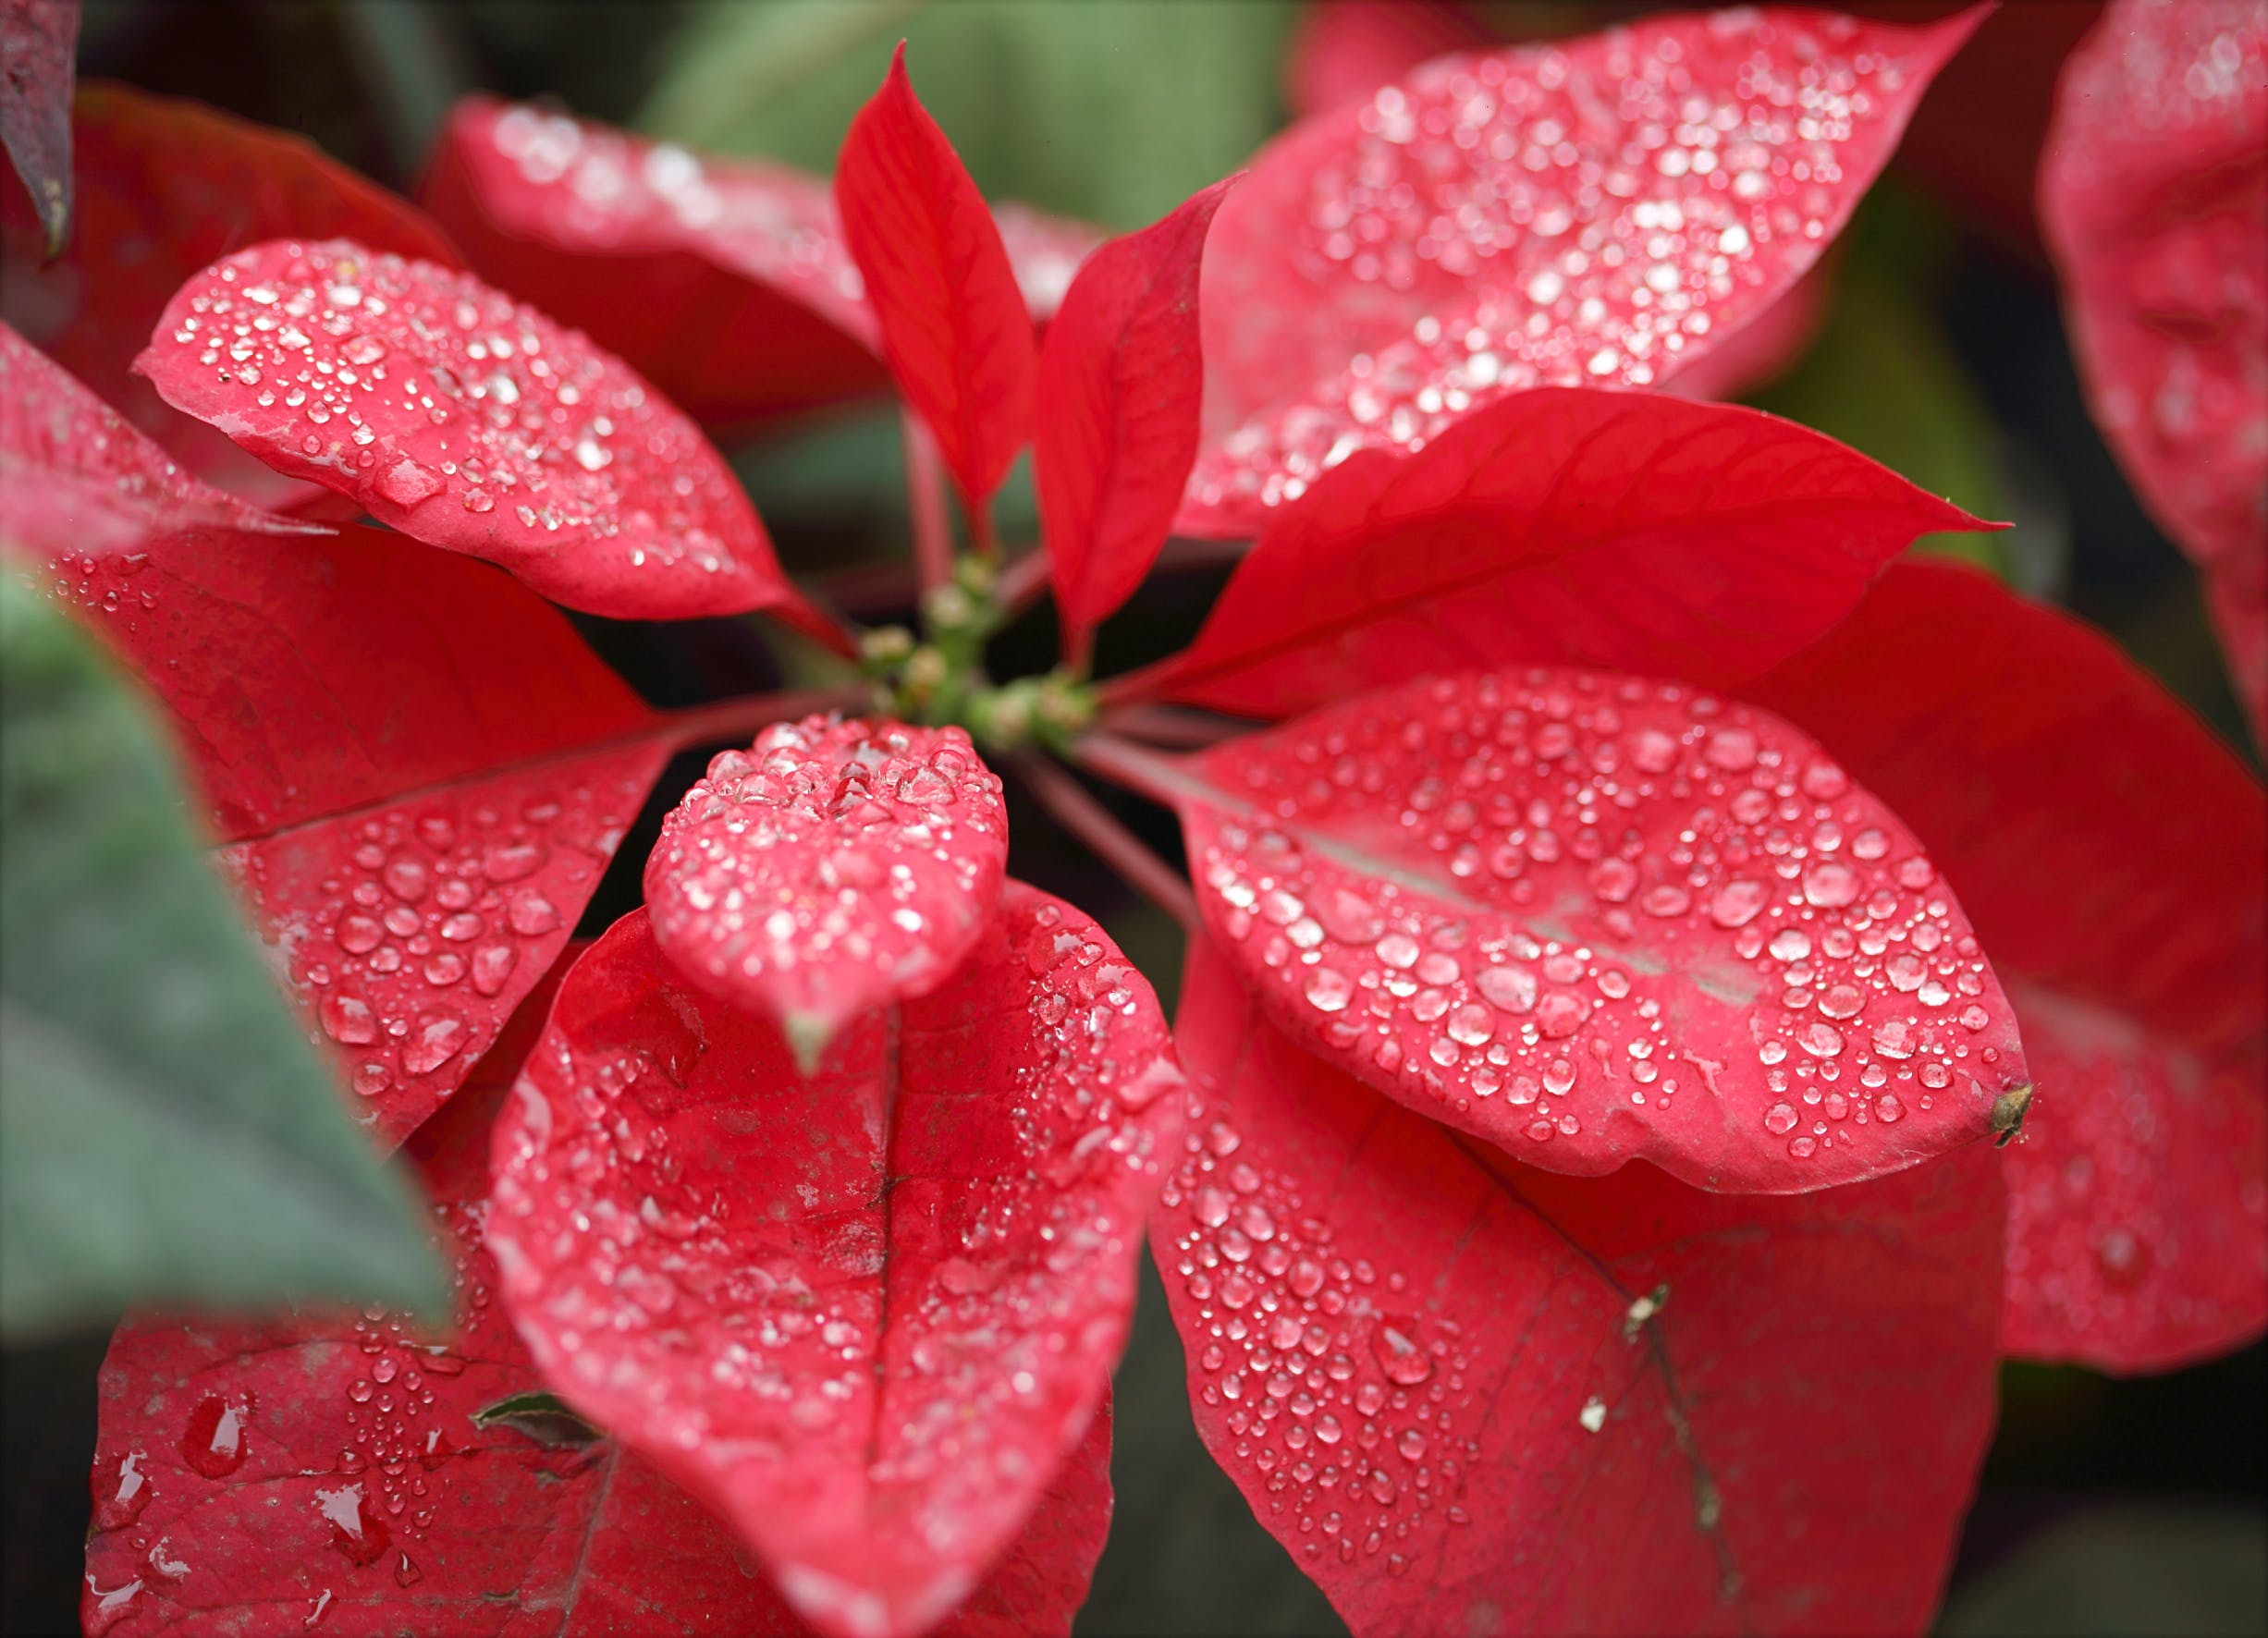 Kostenloses Stock Foto zu natur, garten, blütenblätter, pflanze